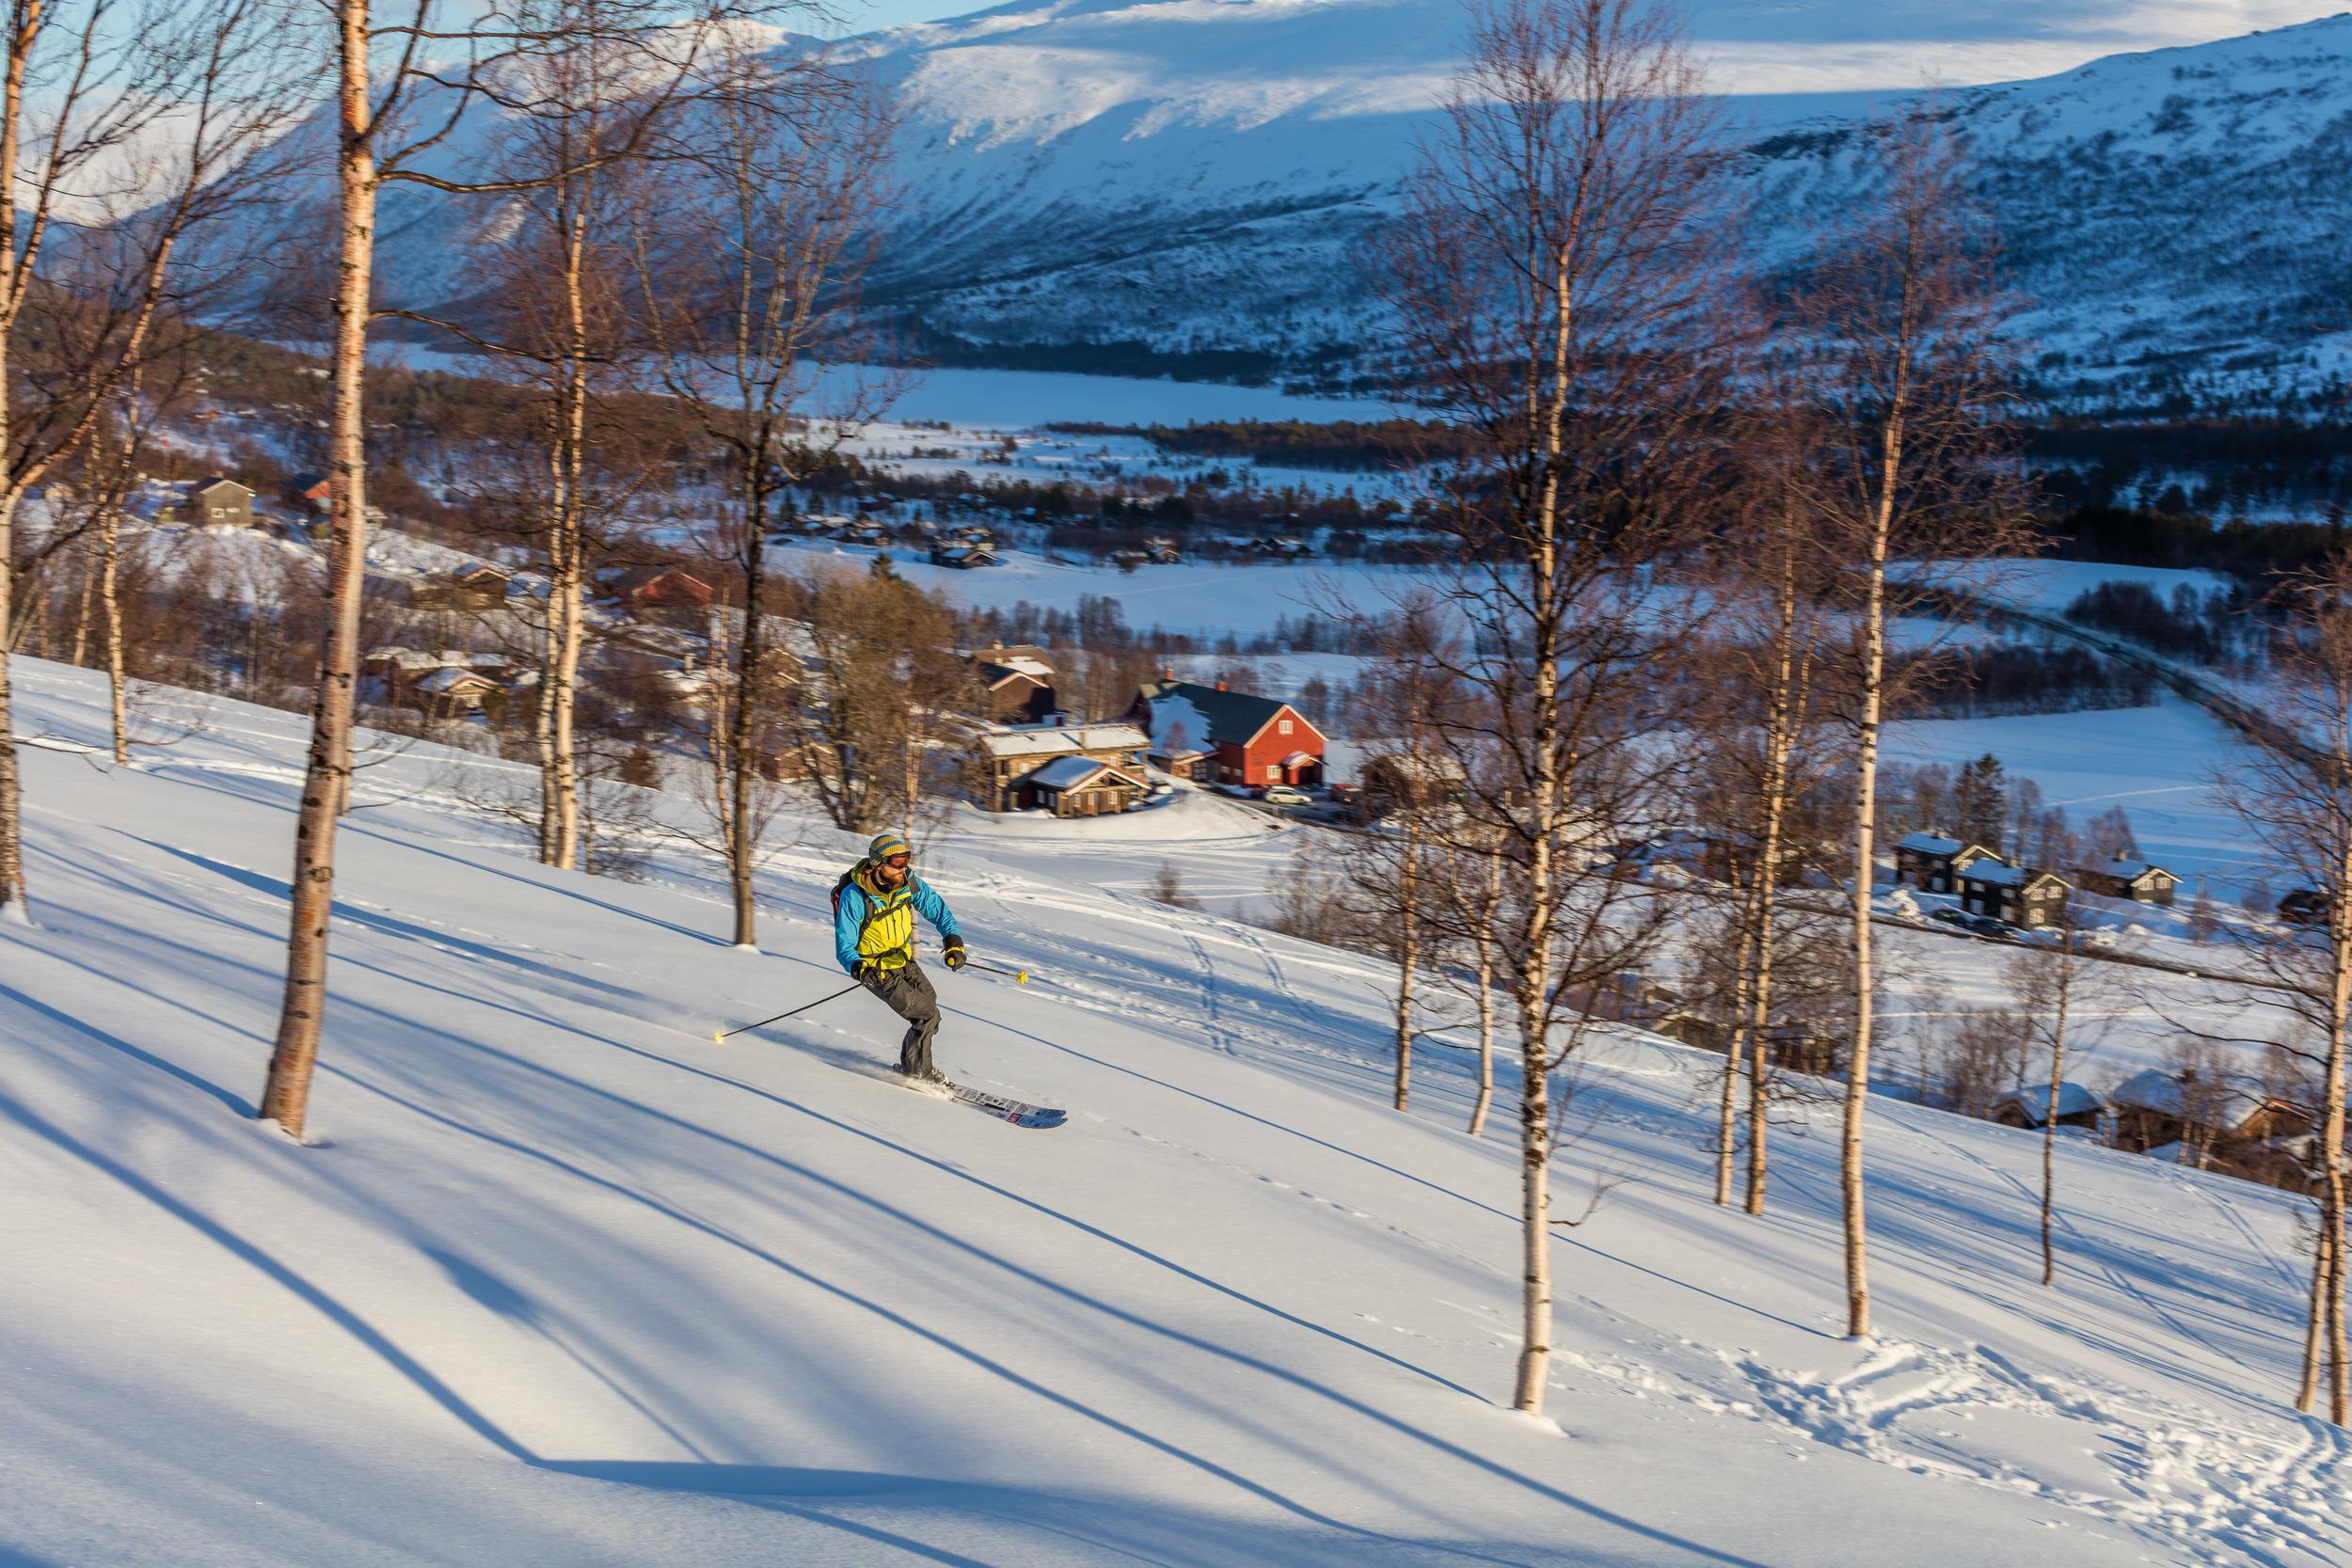 Bortistu-Storlidalen-Oppdal-Norge-Sven-Erik-Knoff-FotoKnoff-56.jpg